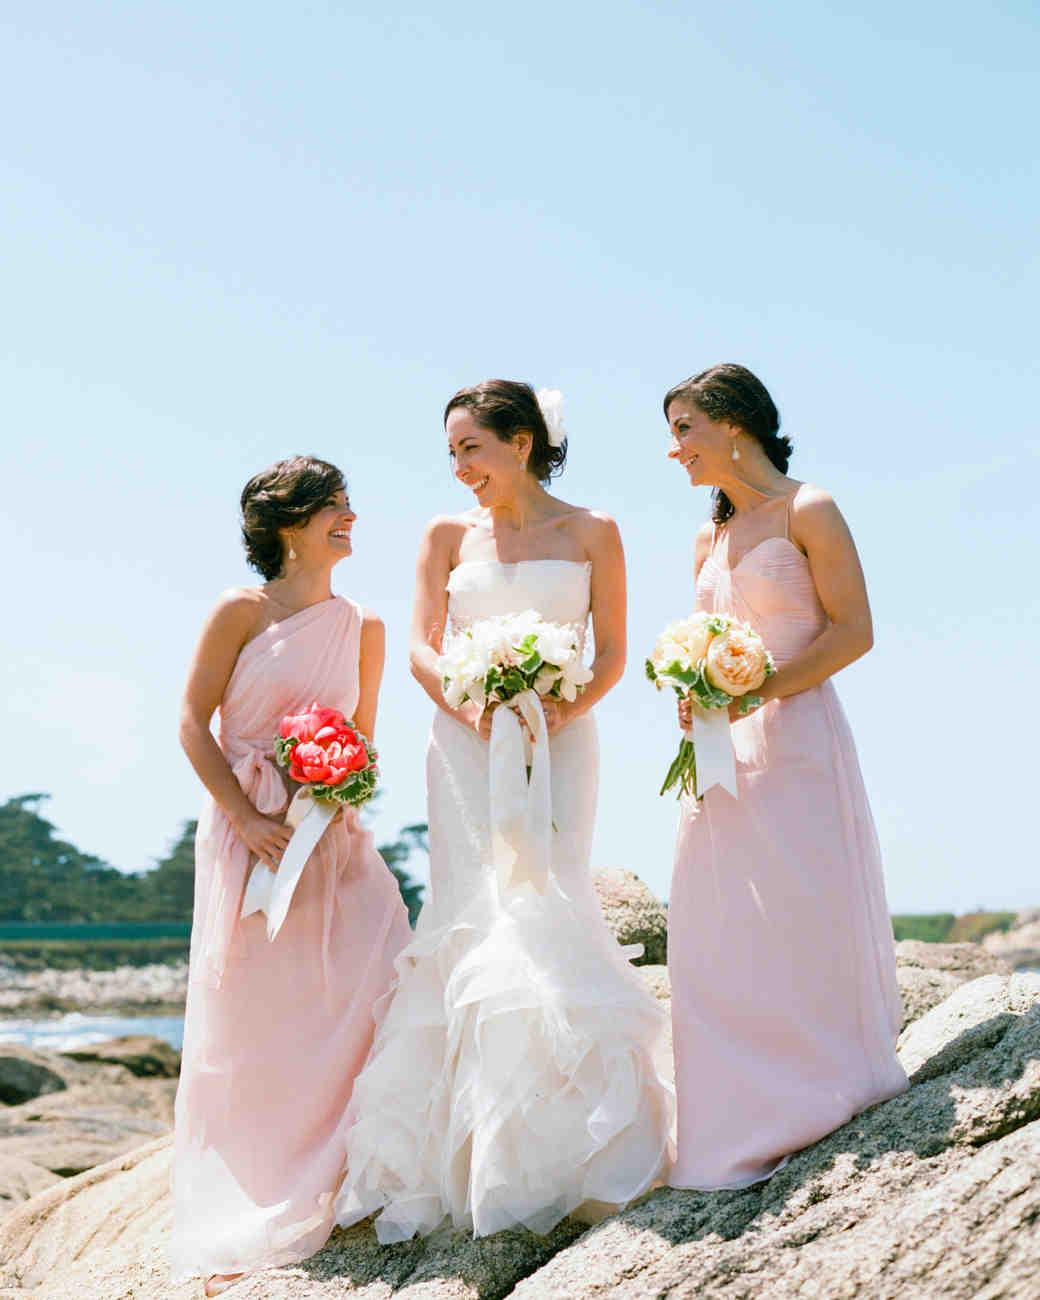 marwa-peter-wedding-bridesmaids-0414.jpg